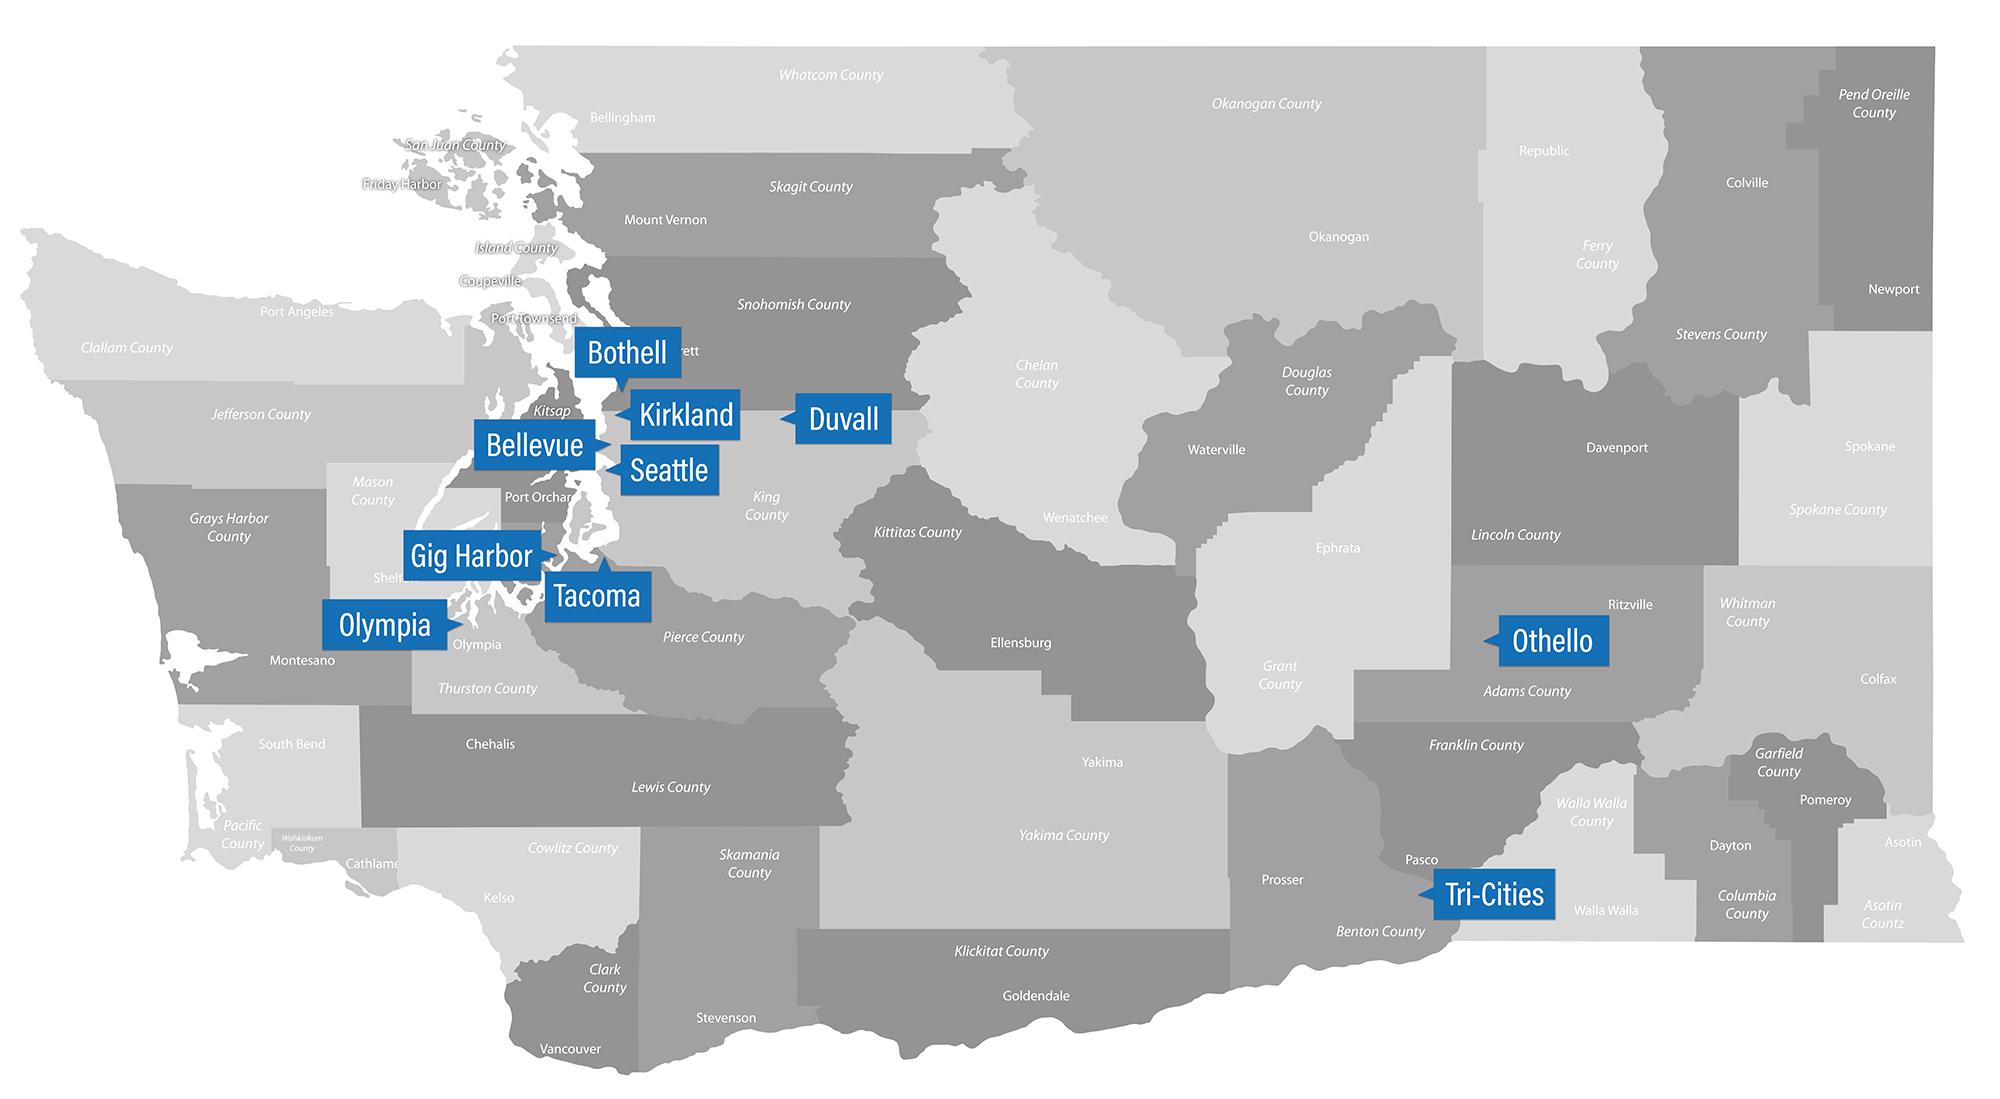 AdobeStock_88102070 [Converted] Washington State Counties Map.jpg